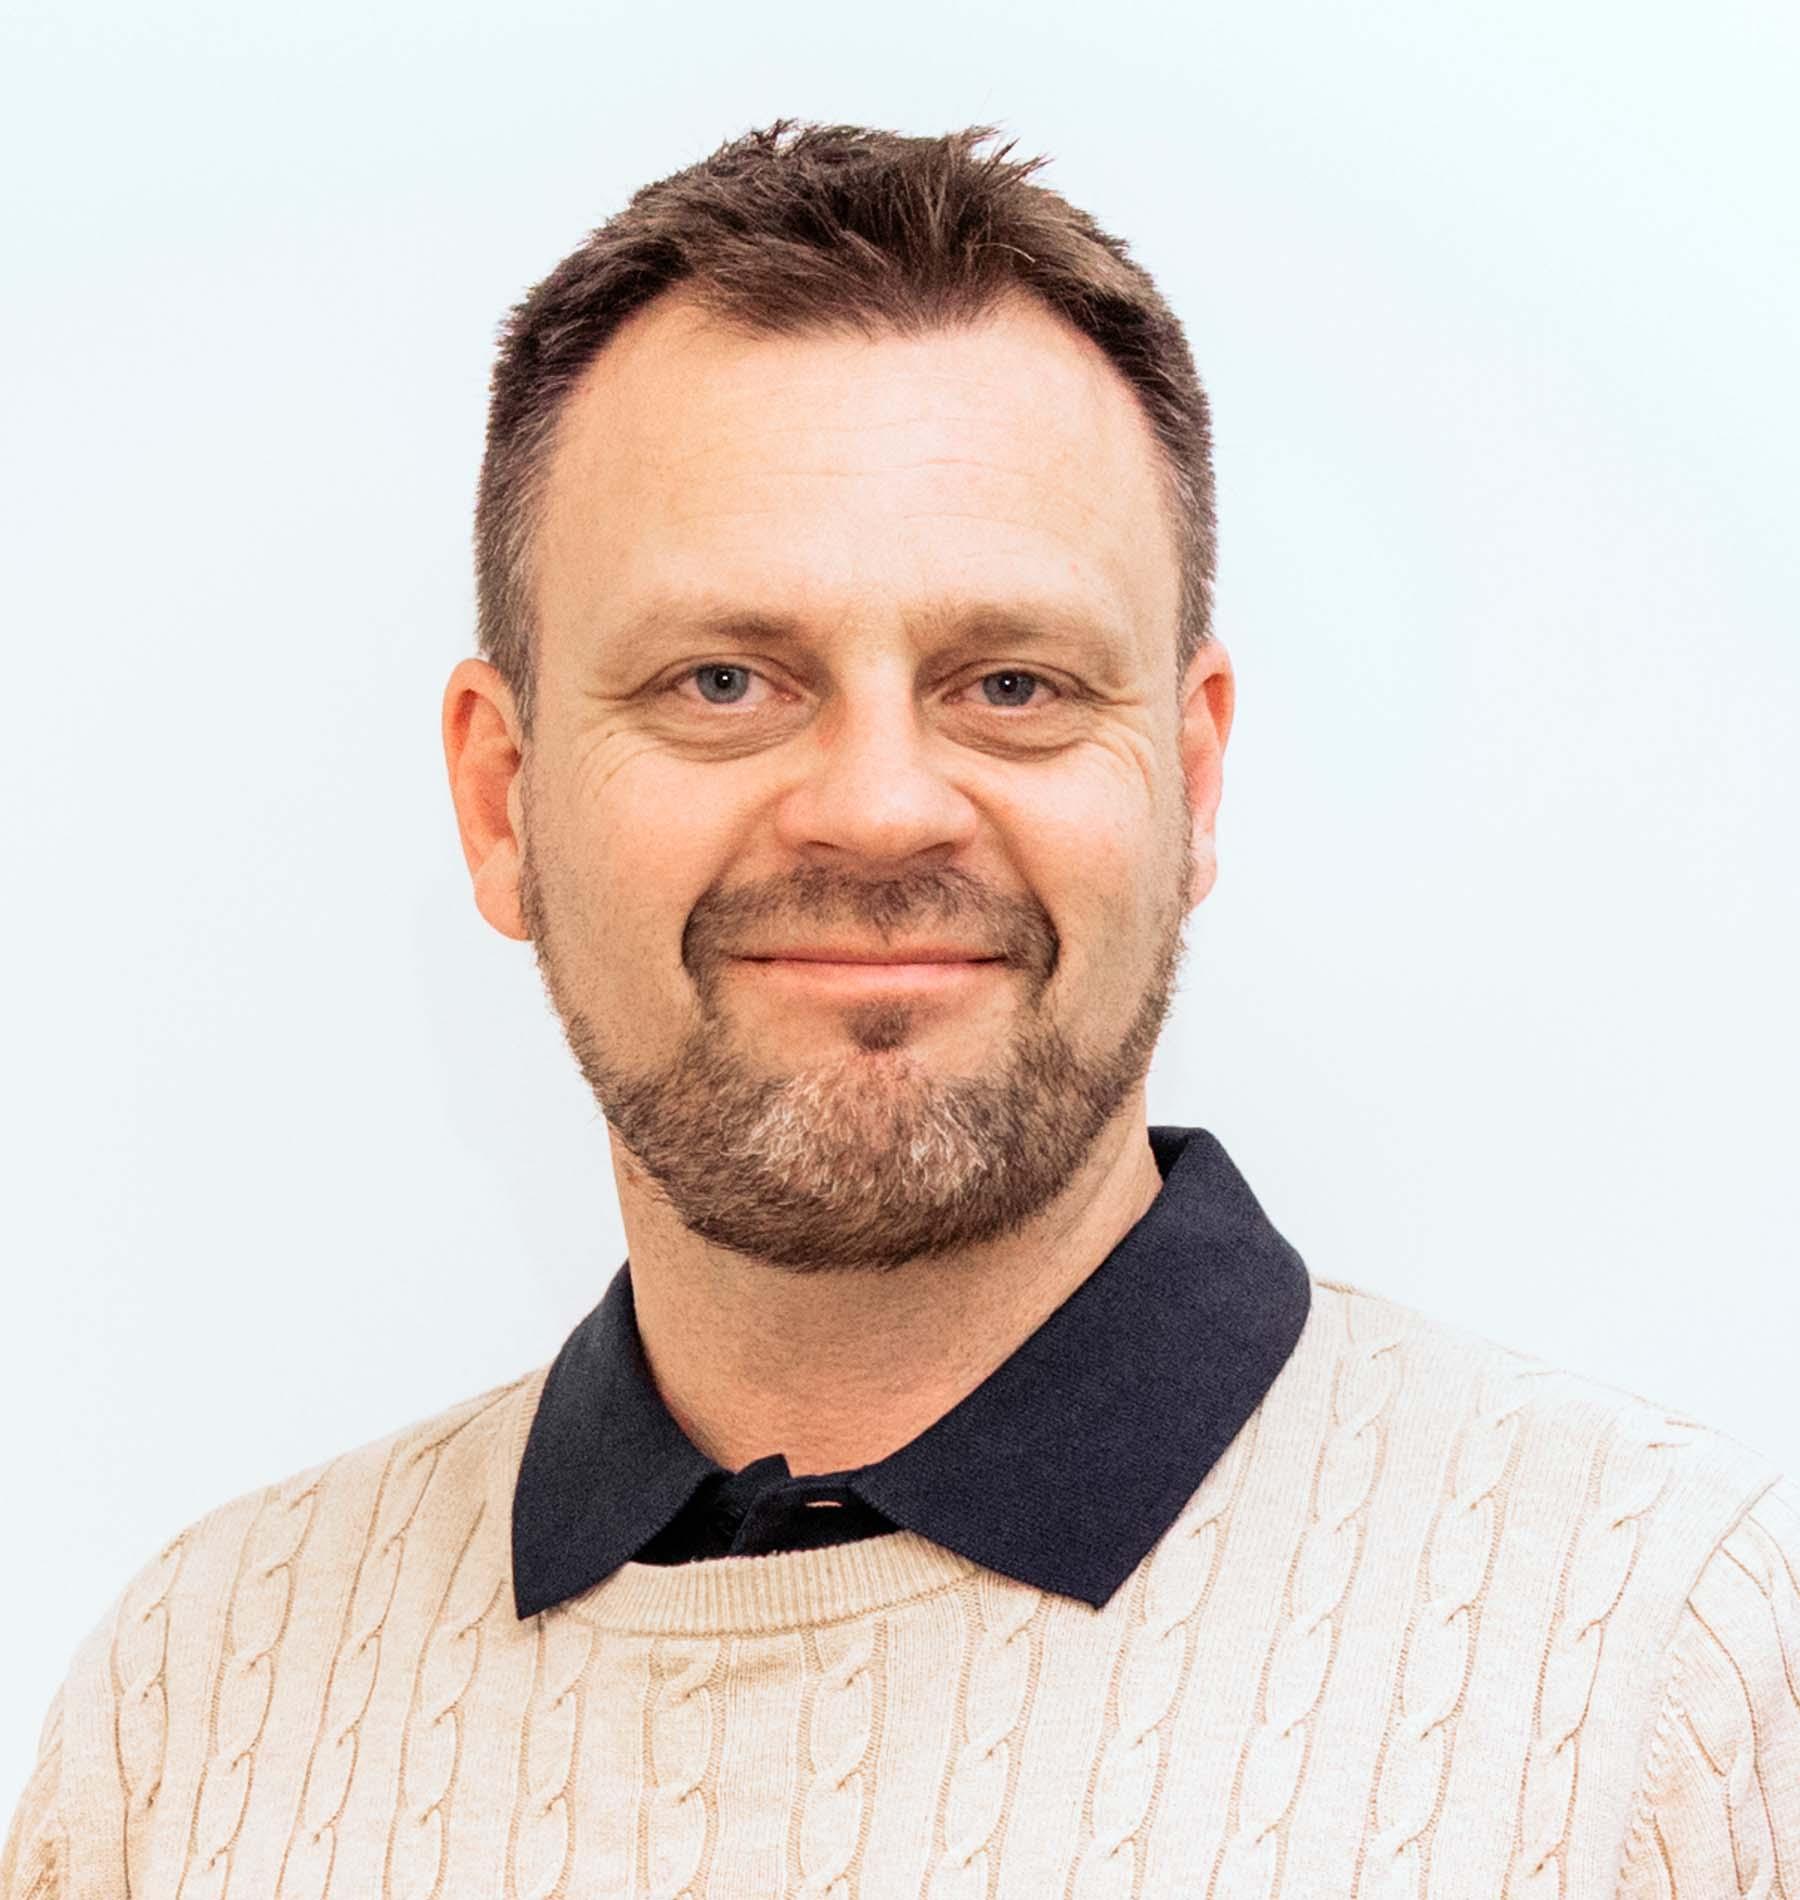 Martin Krångh